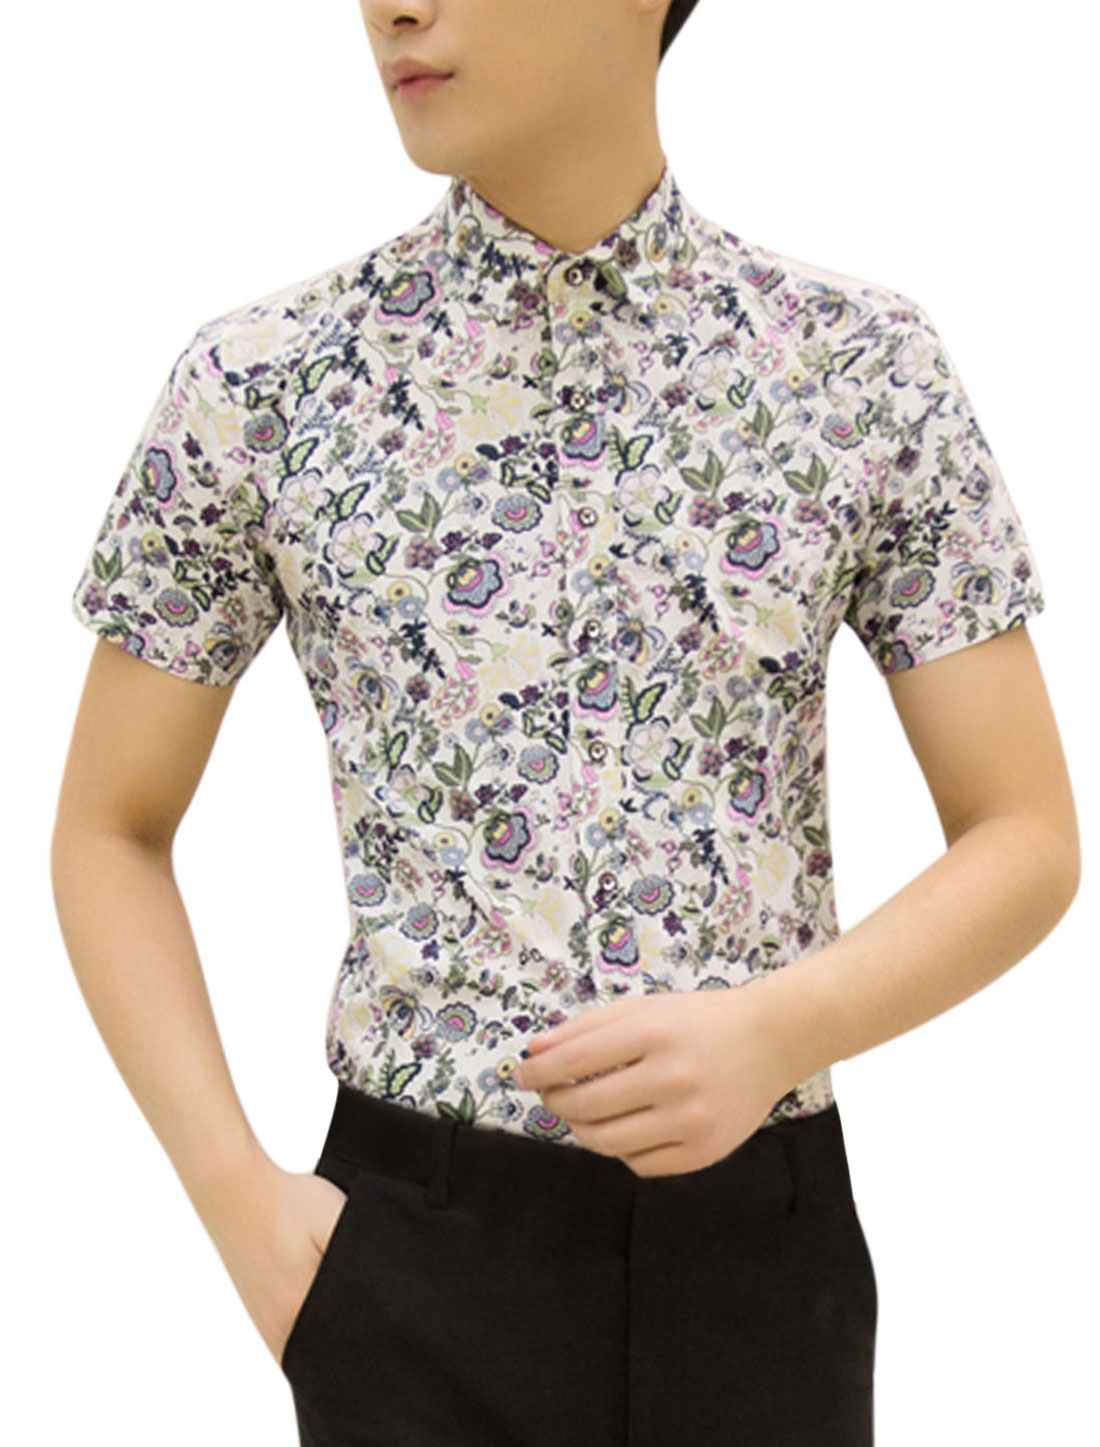 Men Point Collar Floral Pattern Button Up Summer Shirt Beige Yellow M